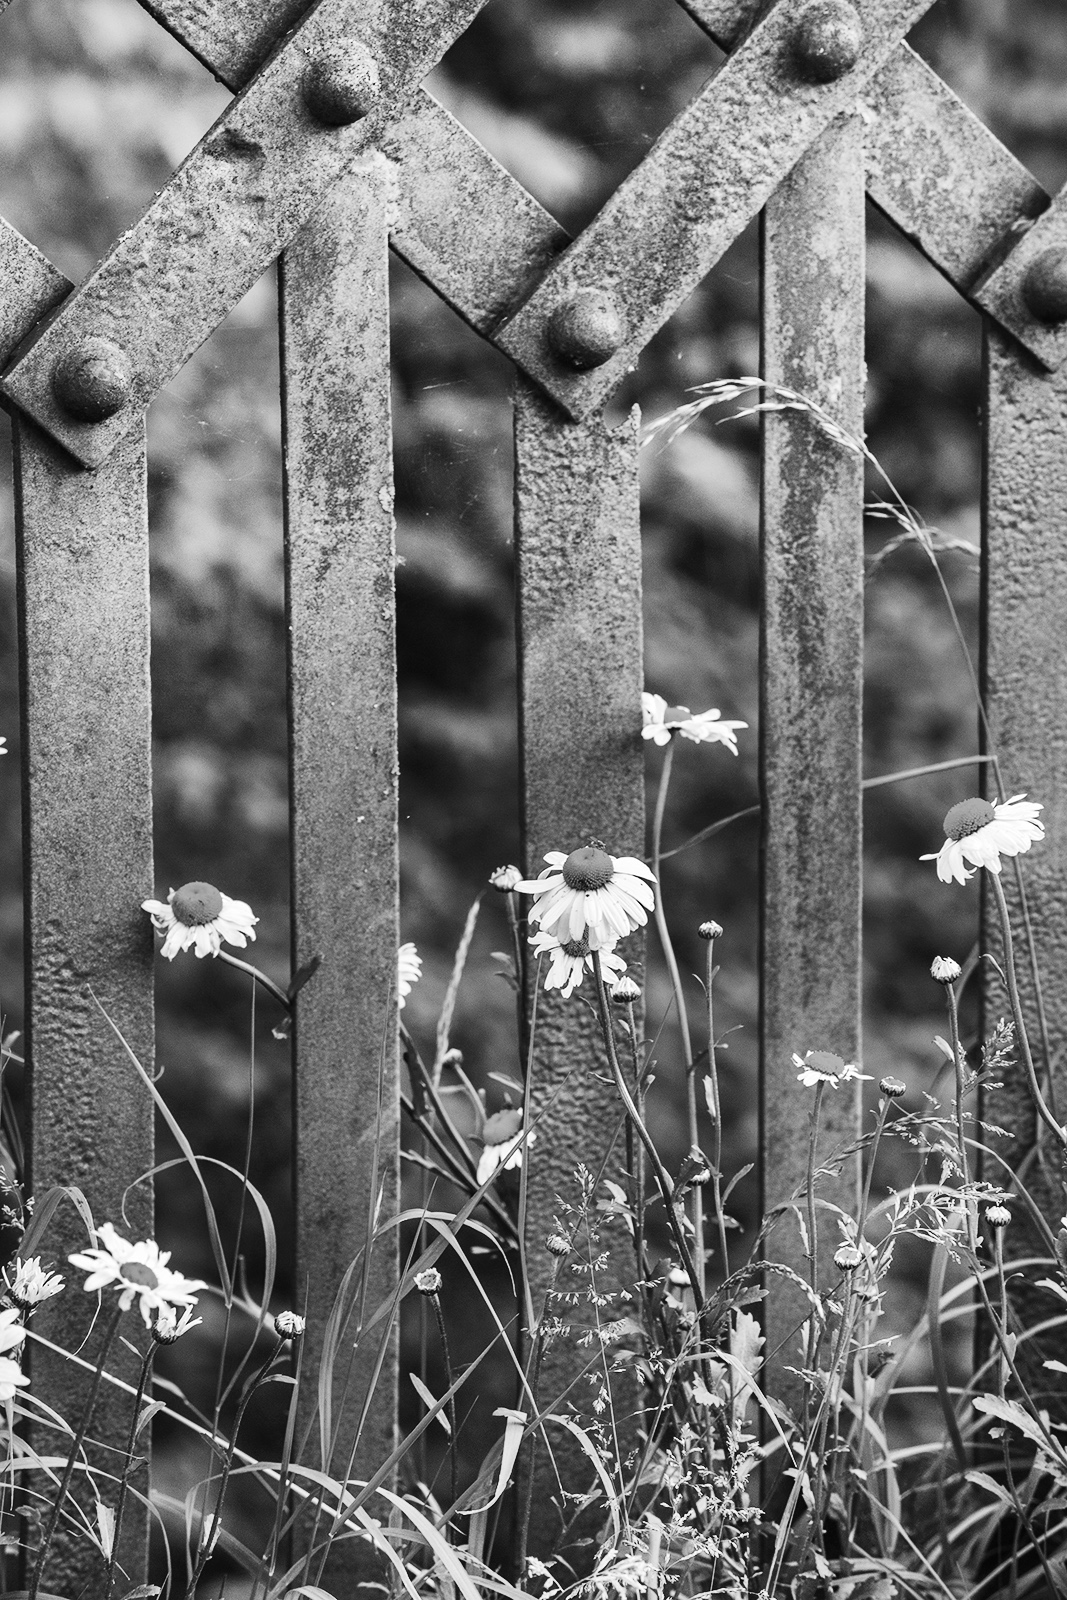 Ox-eye daisy and railings